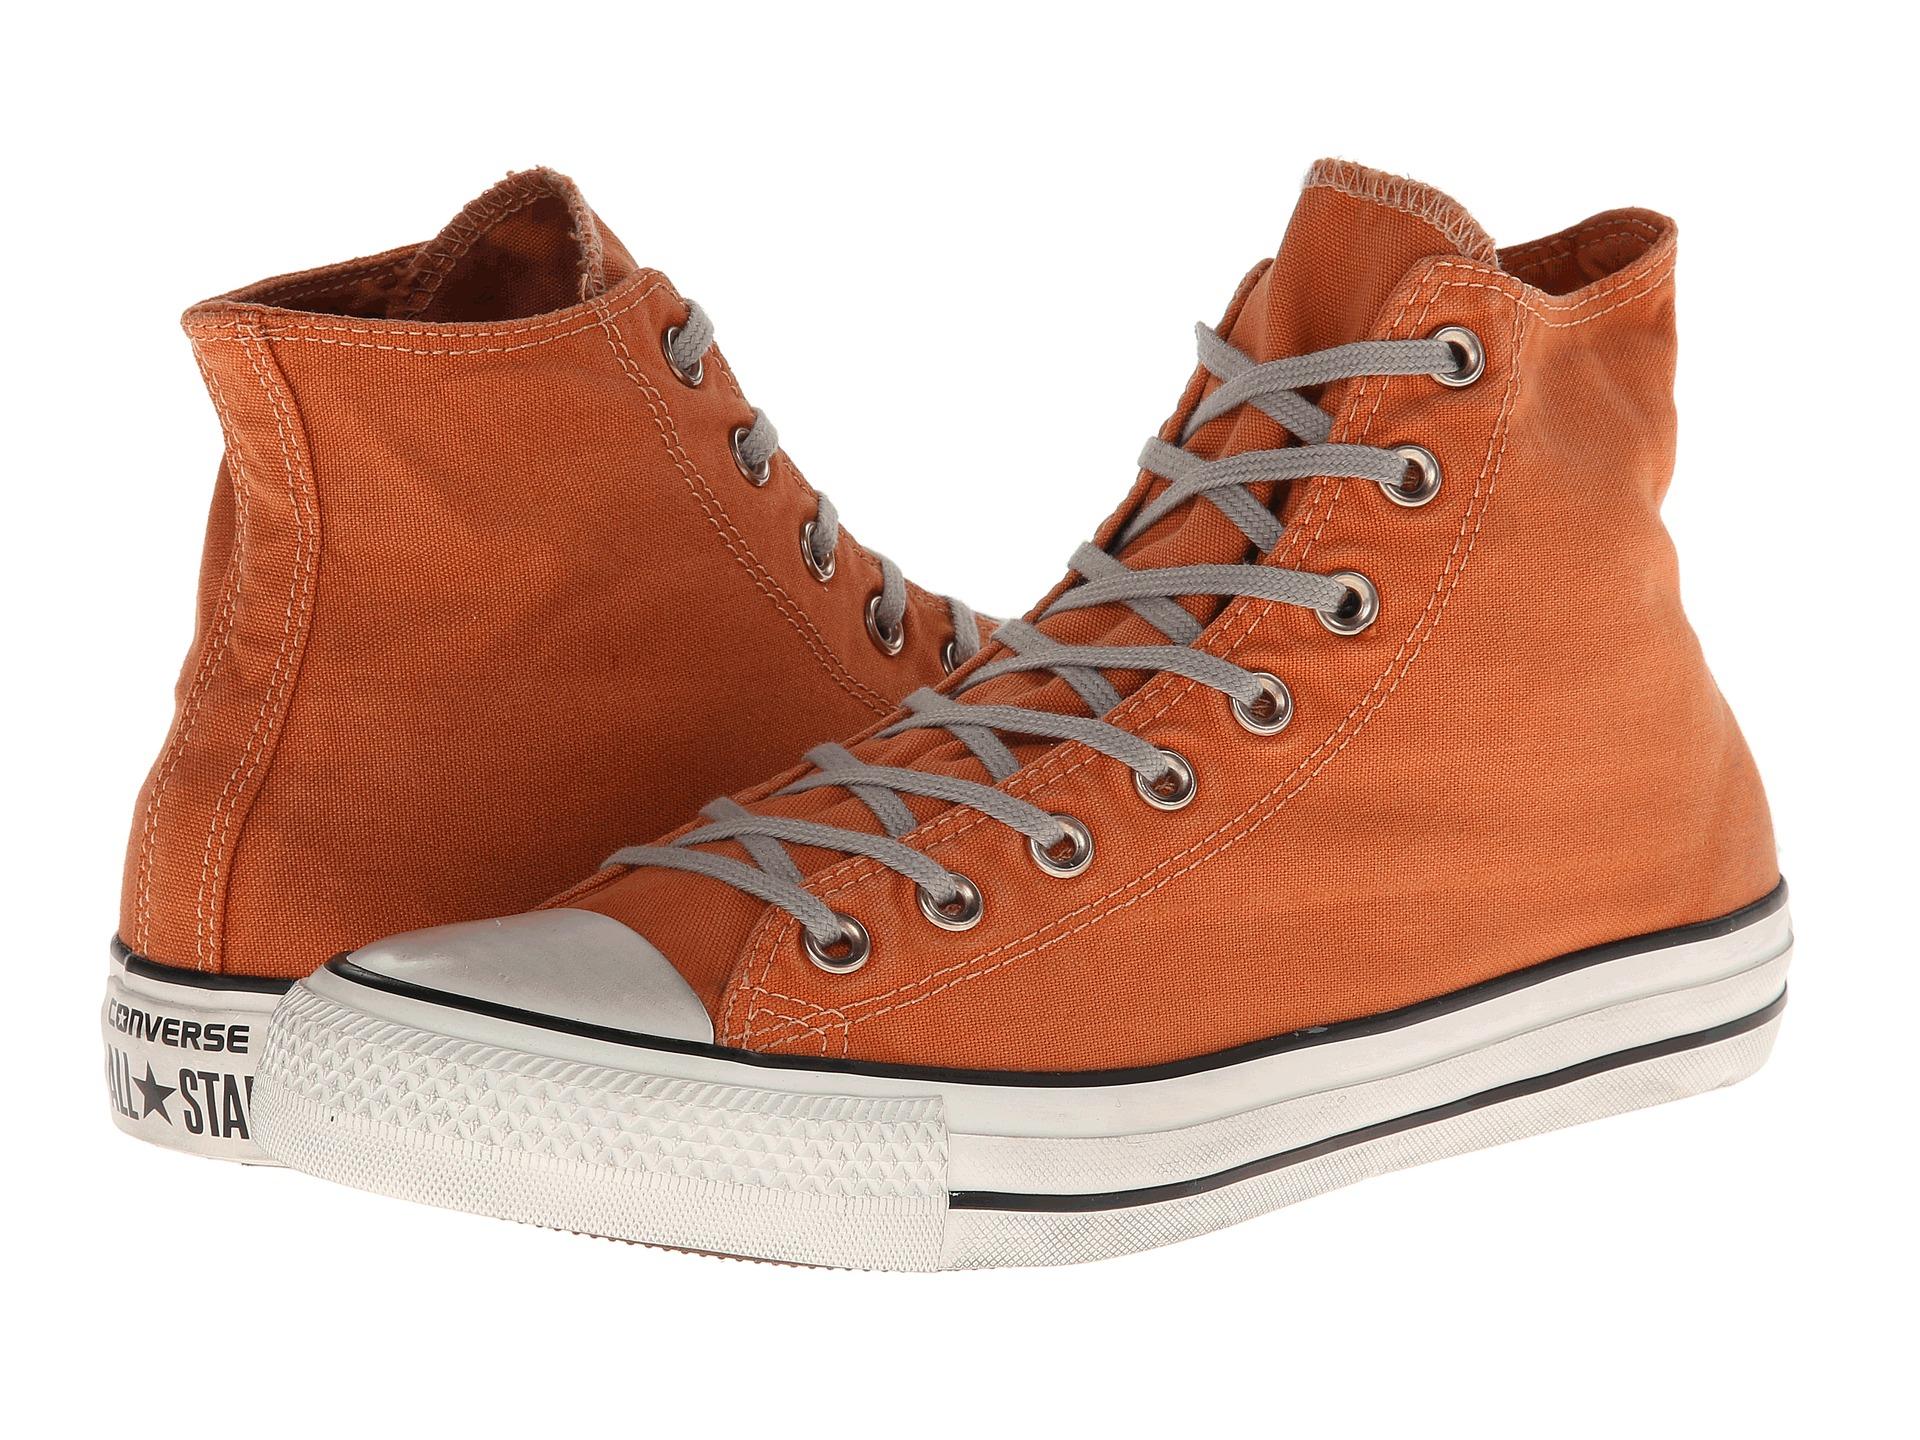 35bae4e00 Converse Chuck Taylor All Star Washed Canvas Hi in Orange - Lyst